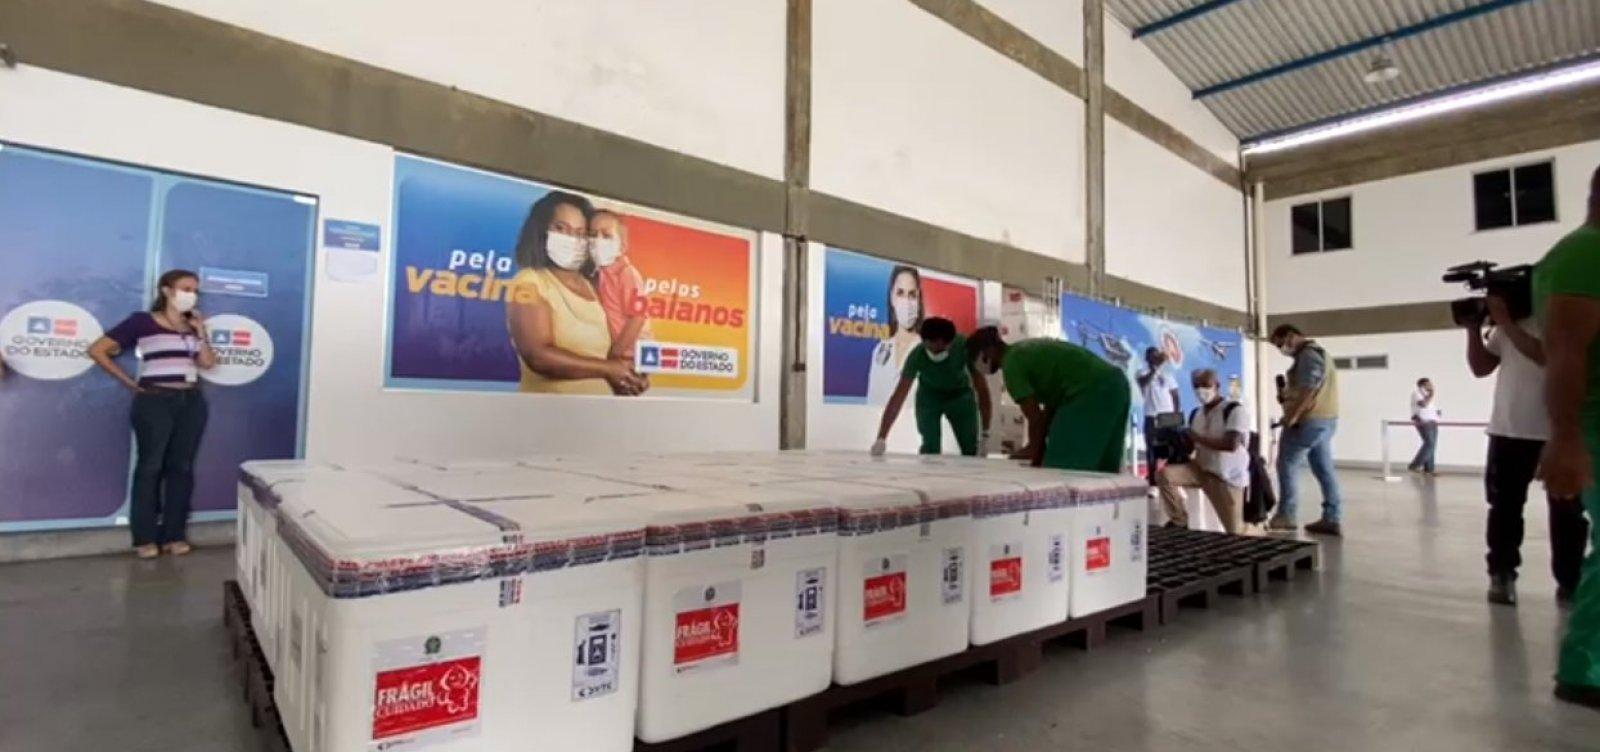 Novas doses da vacina covid-19 chegam na Bahia